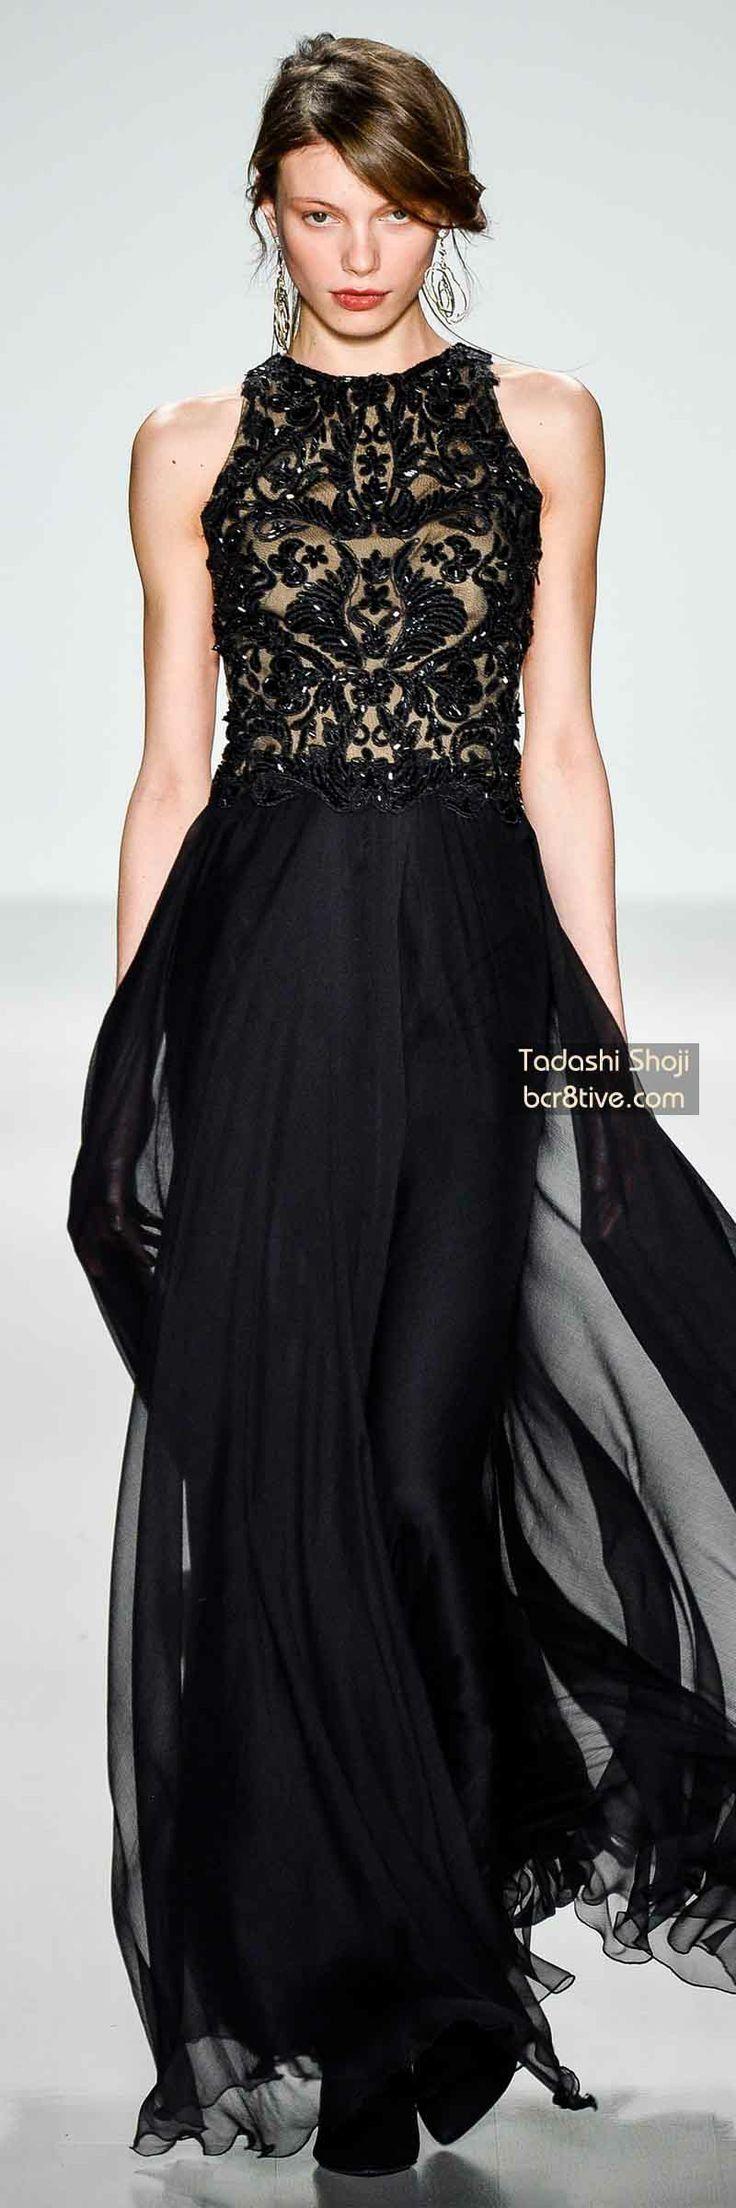 Tadashi Shoji FW 2014 #NYFW >> Margaery Tyrell mourning dress